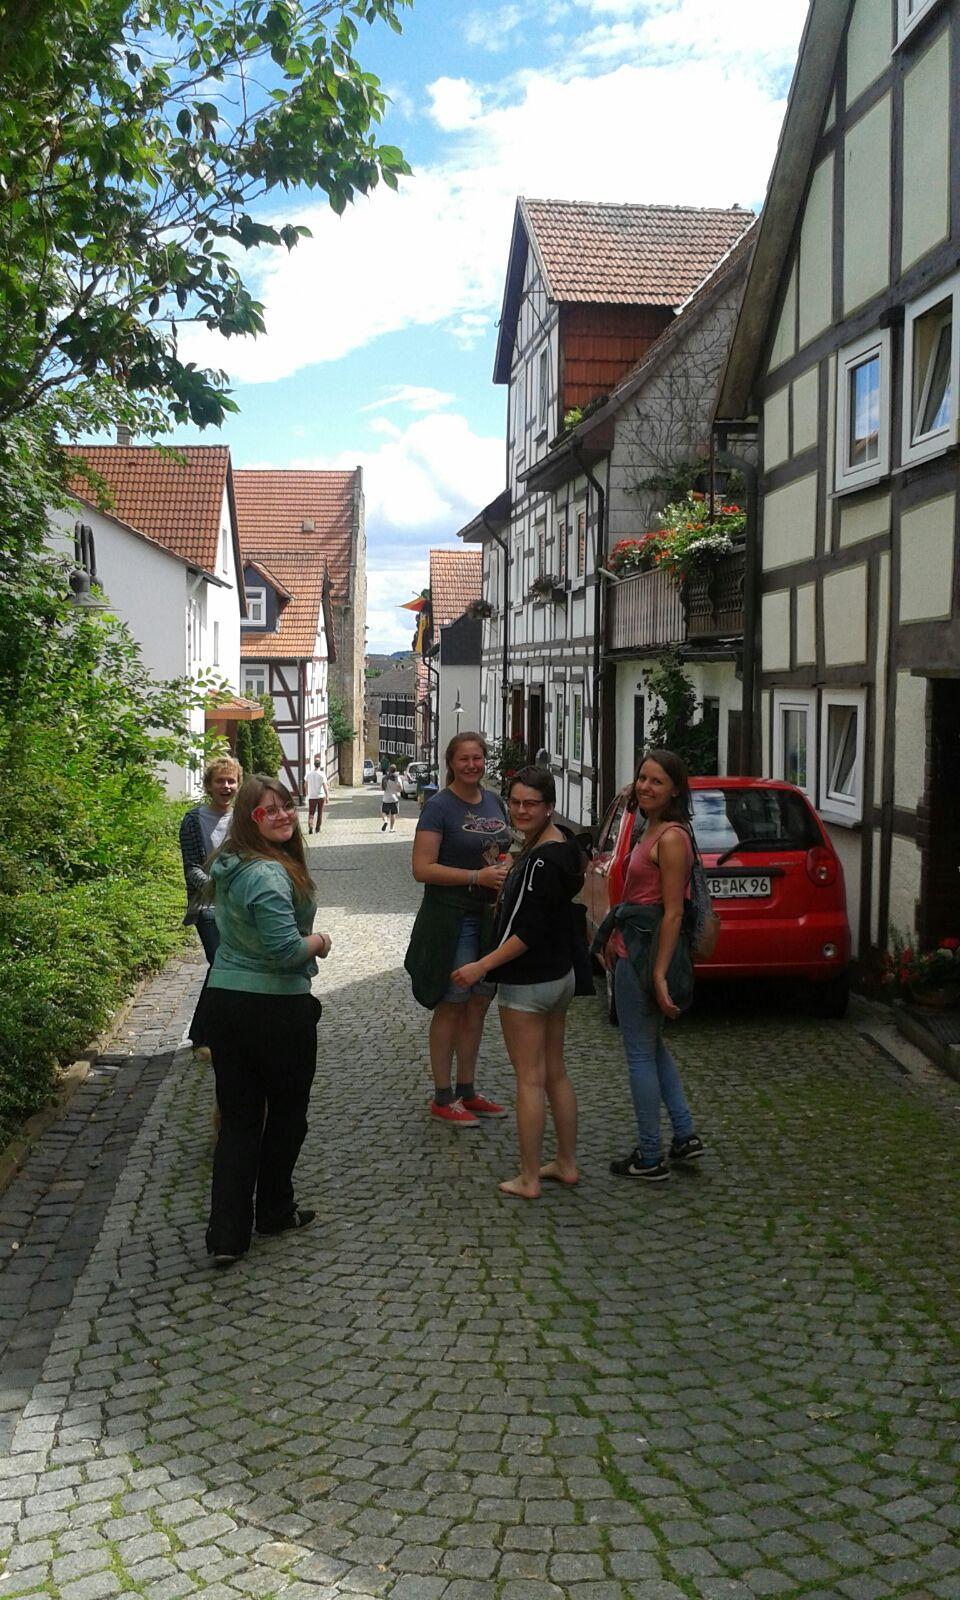 Spaziergang in Korbach